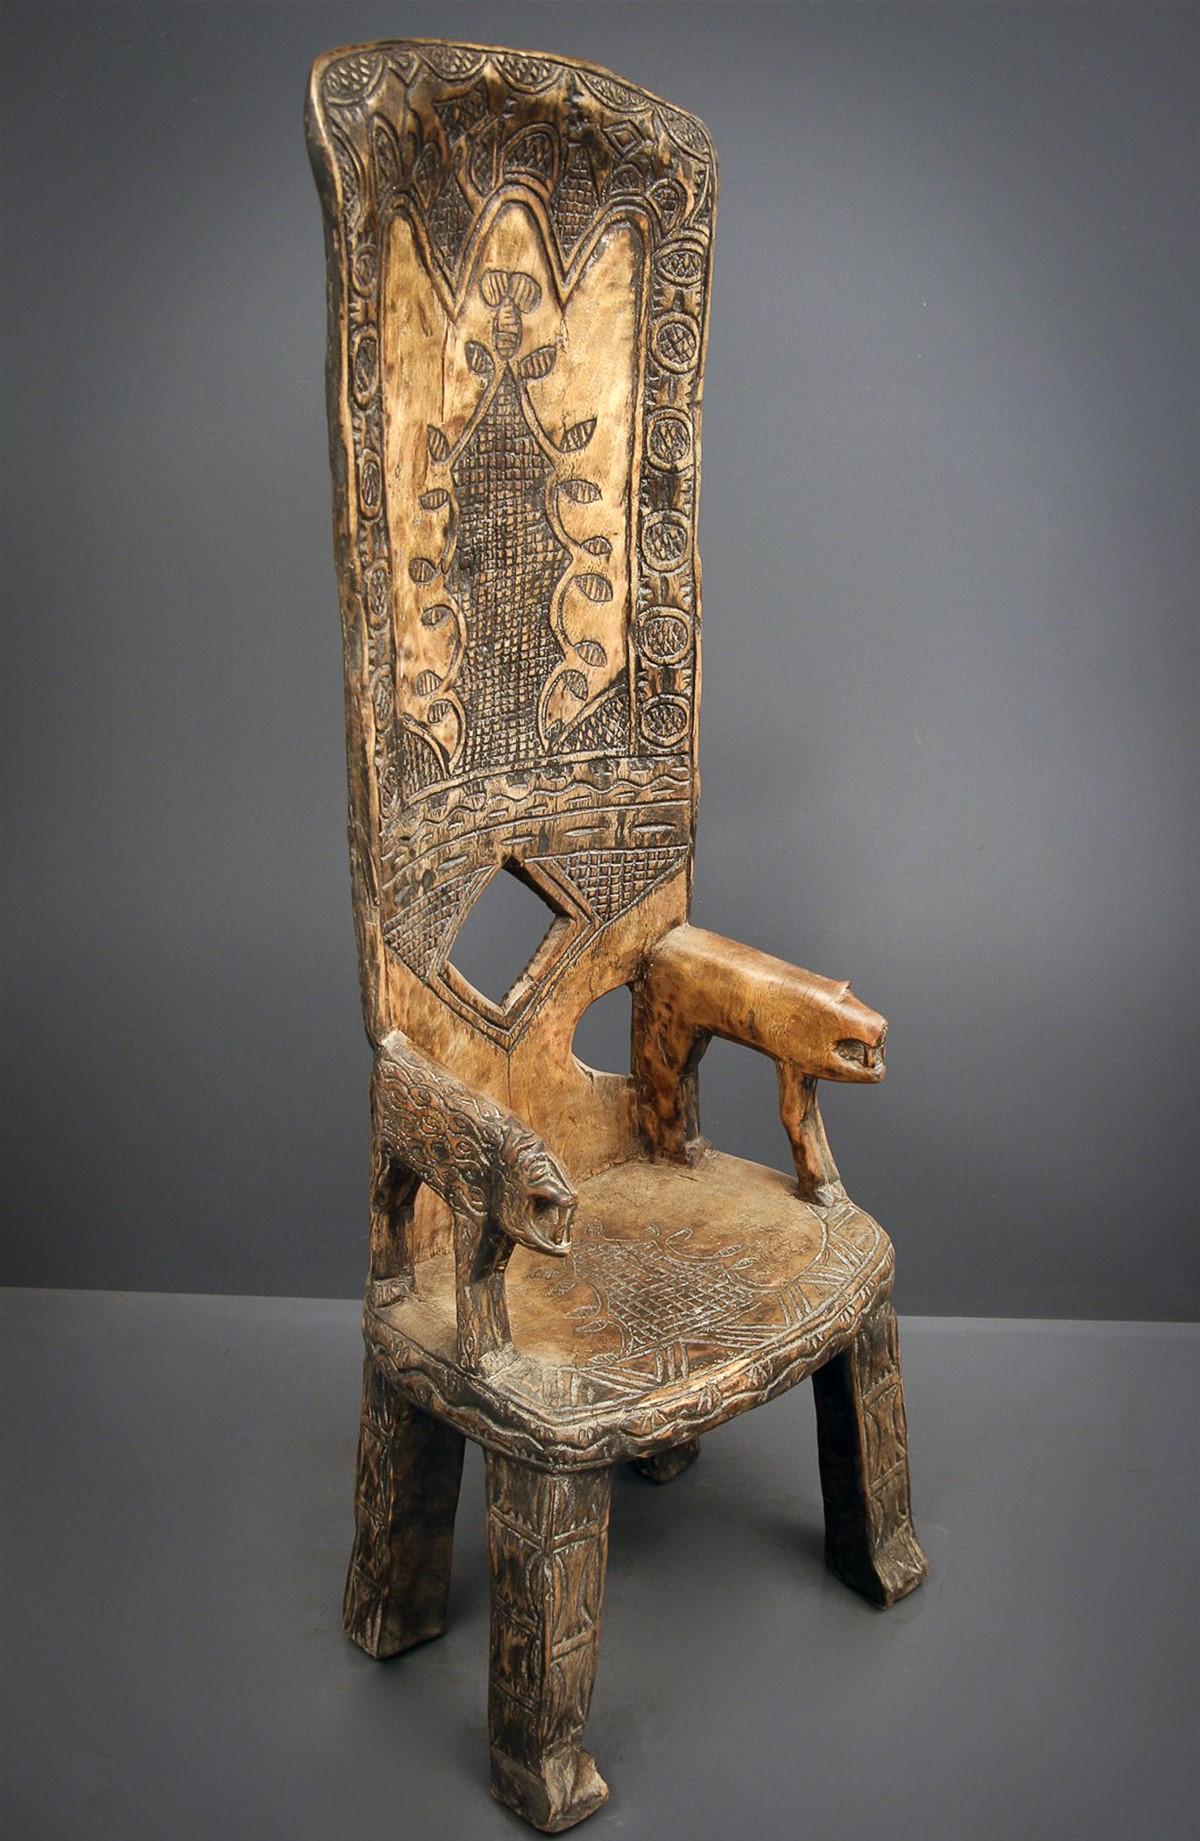 Chaise de dignitaire baoul 6118 chaise art africain - Chaise en bois africaine ...